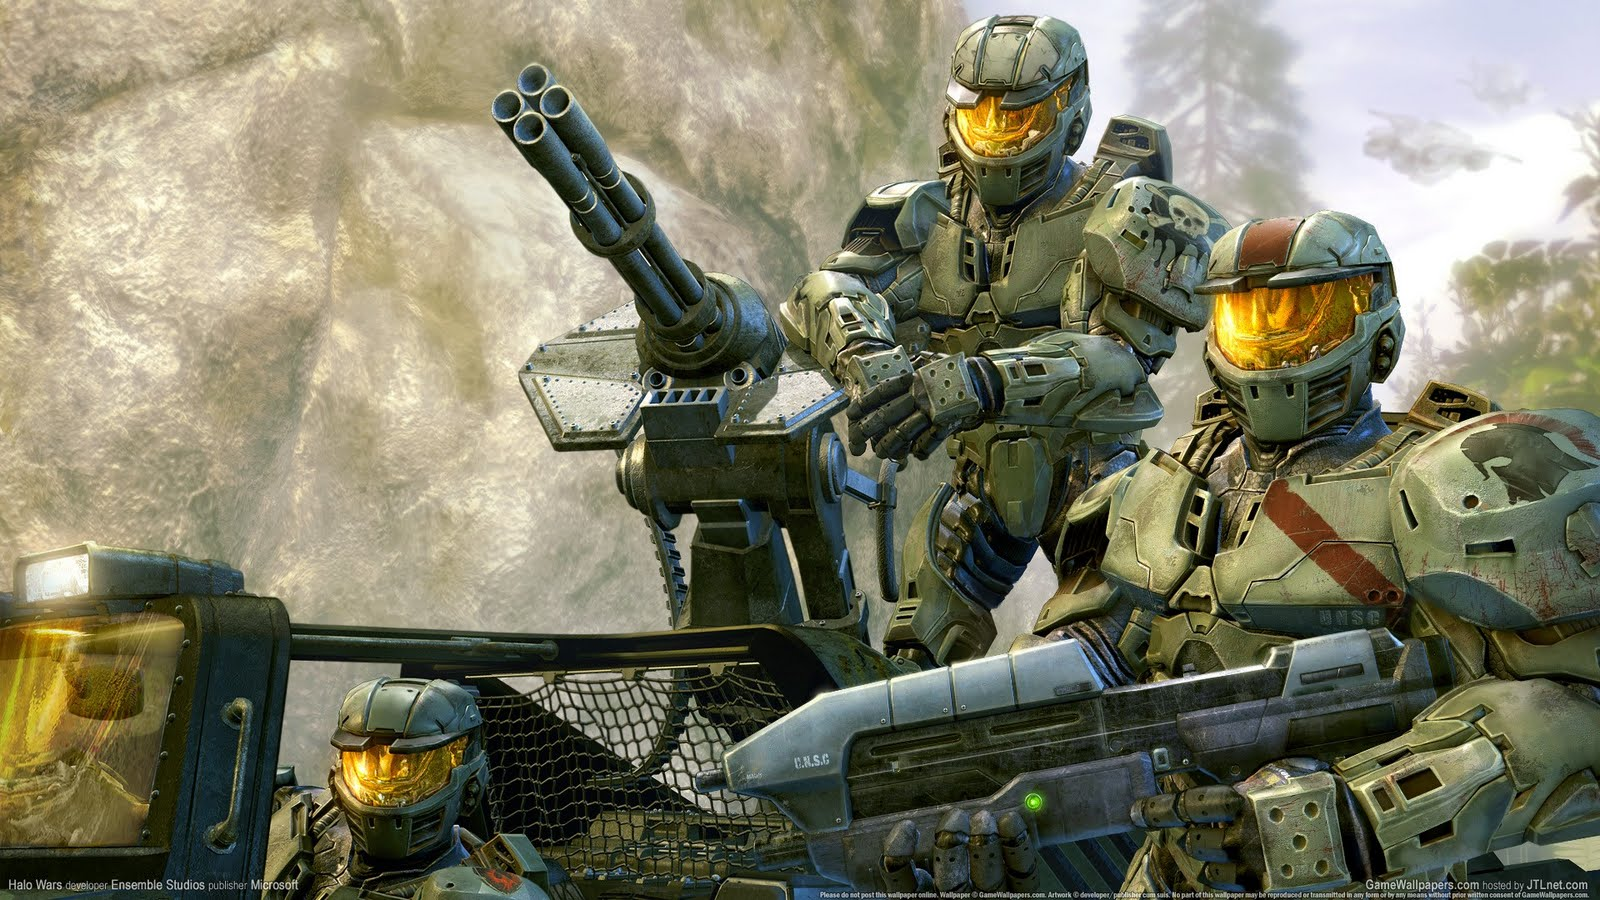 Wallpapers de Halo en HD DragonXoft 1600x900